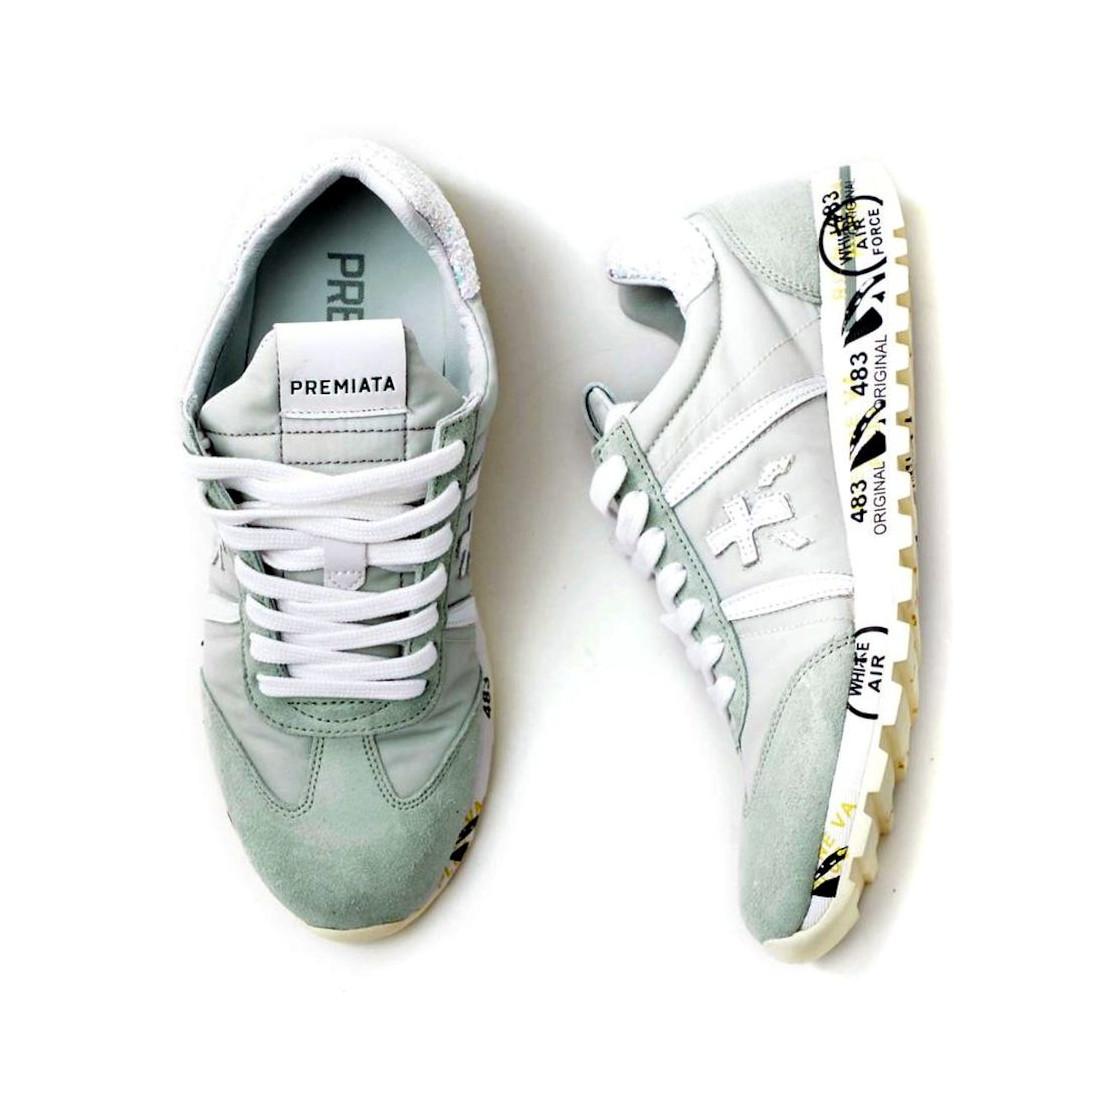 sneakers damen premiata lucy d4549 8566